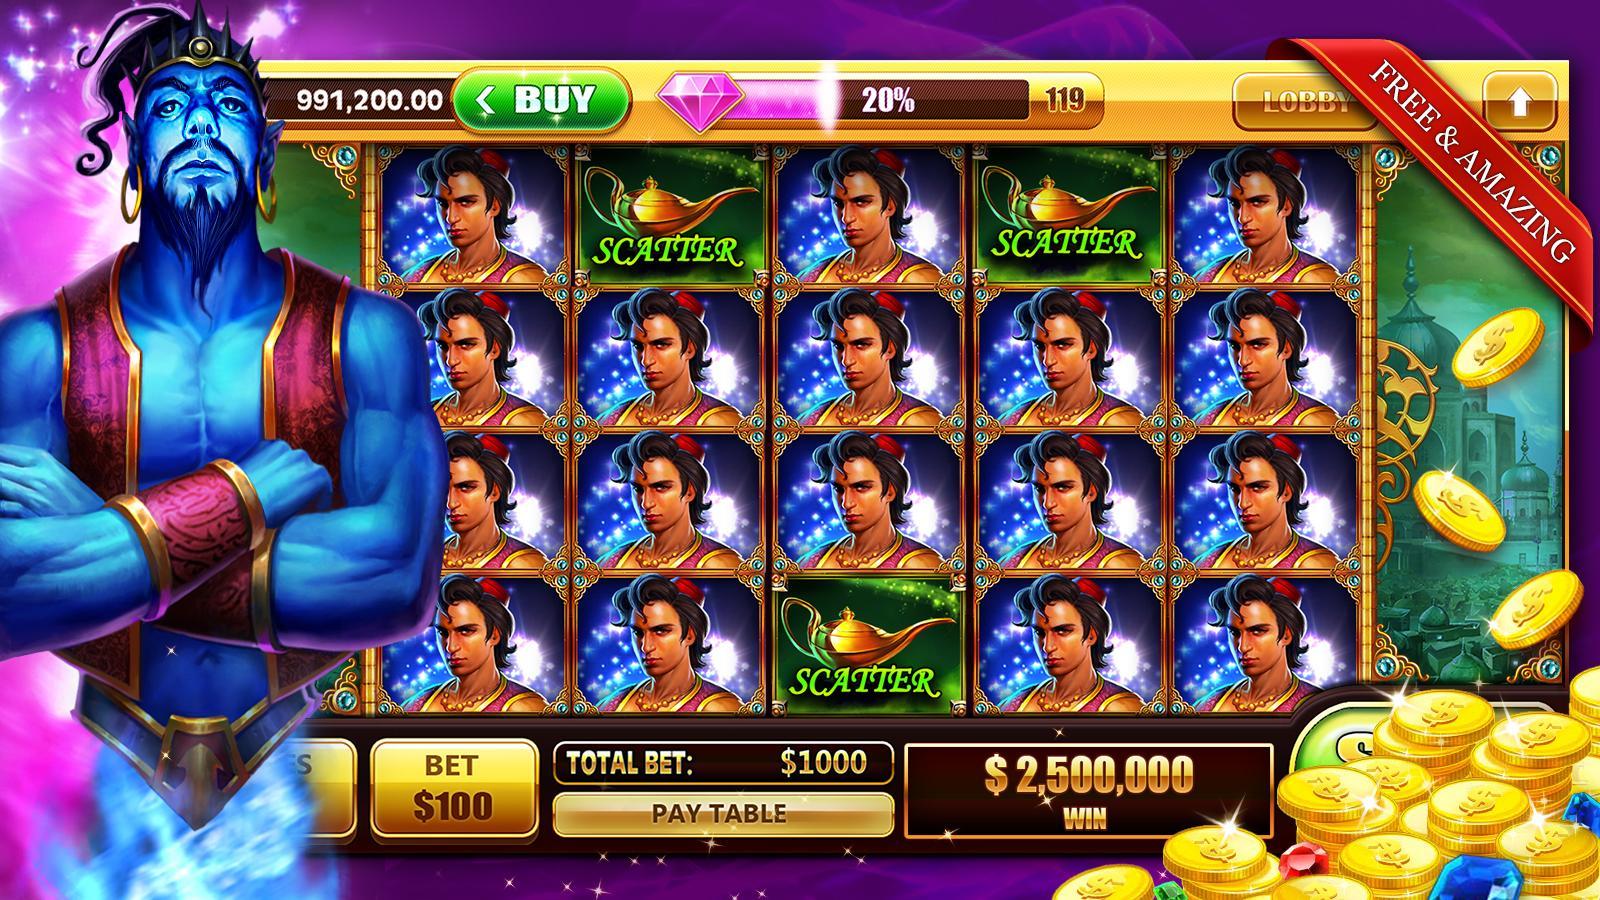 7 freeslots.com party bonus free slots home 1 2 3 4-5 songza